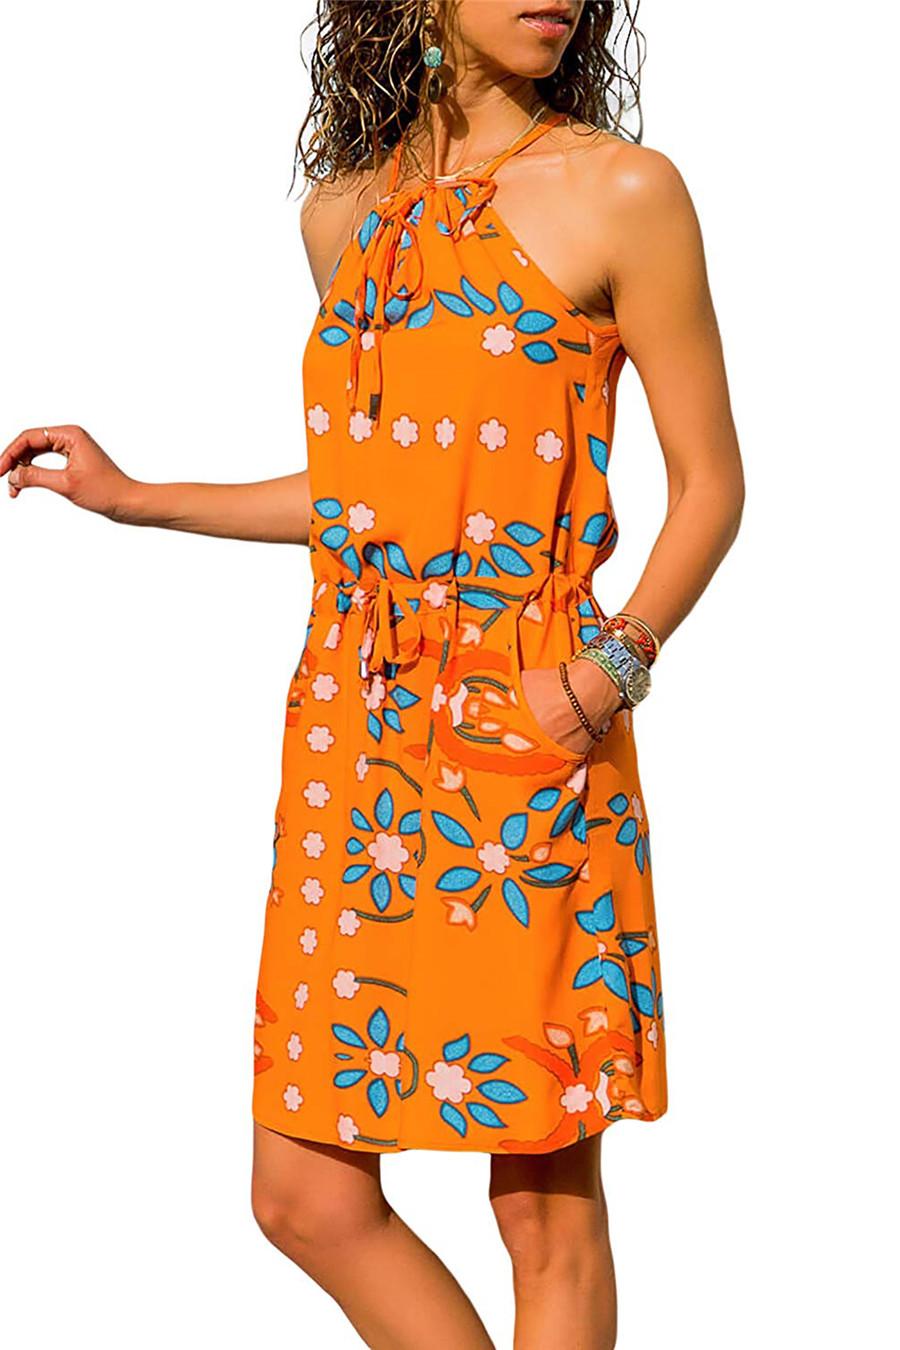 Gladiolus Chiffon Women Summer Dress Spaghetti Strap Floral Print Pocket Sexy Bohemian Beach Dress 2019 Short Ladies Dresses (38)